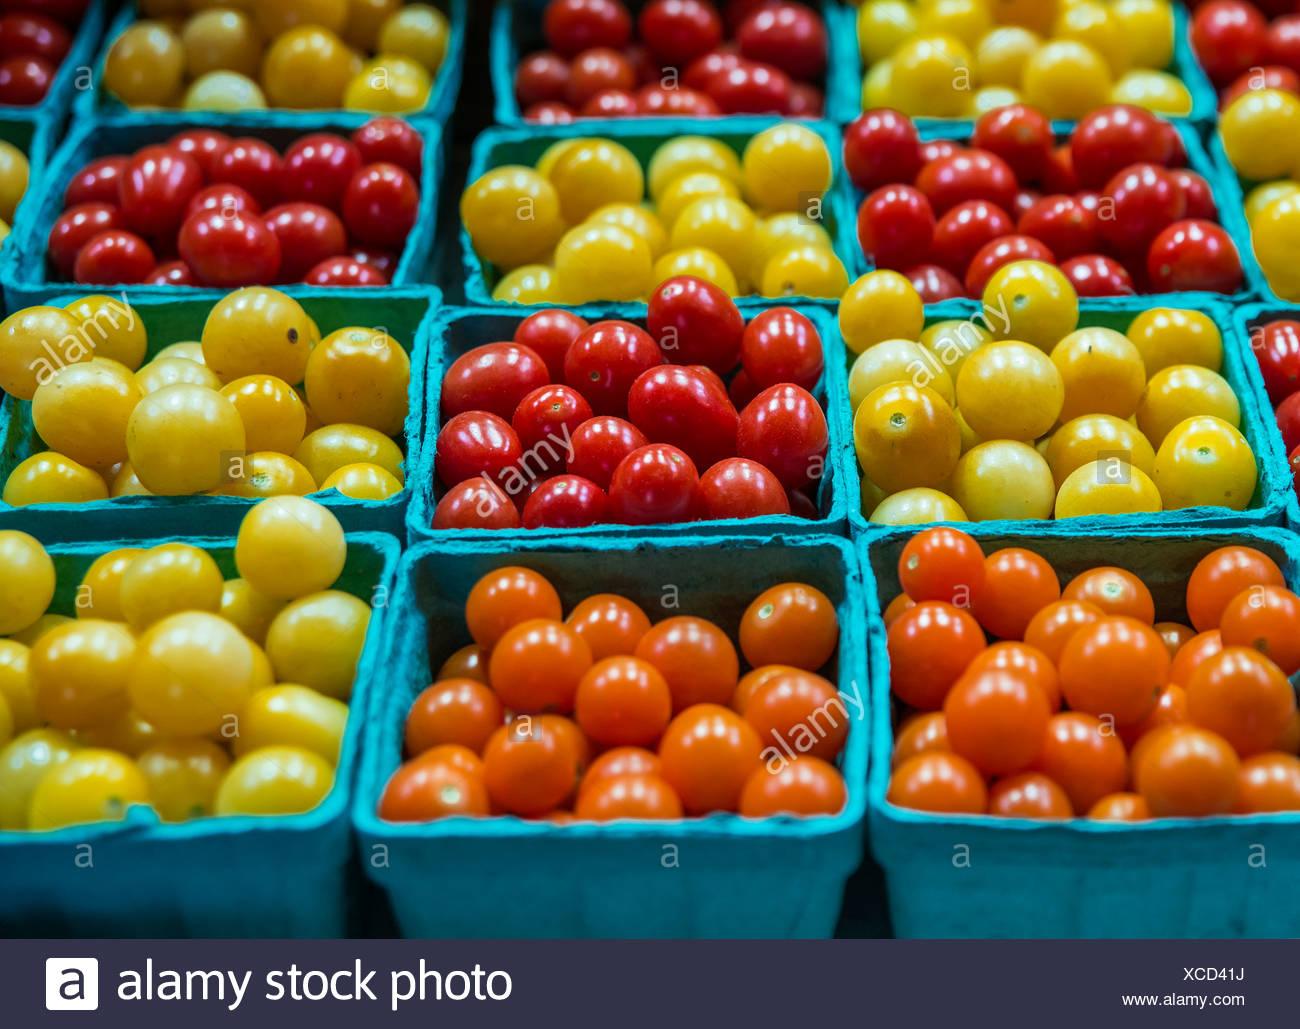 Pint cartons of fresh cherry tomato varieties at farmers market. - Stock Image